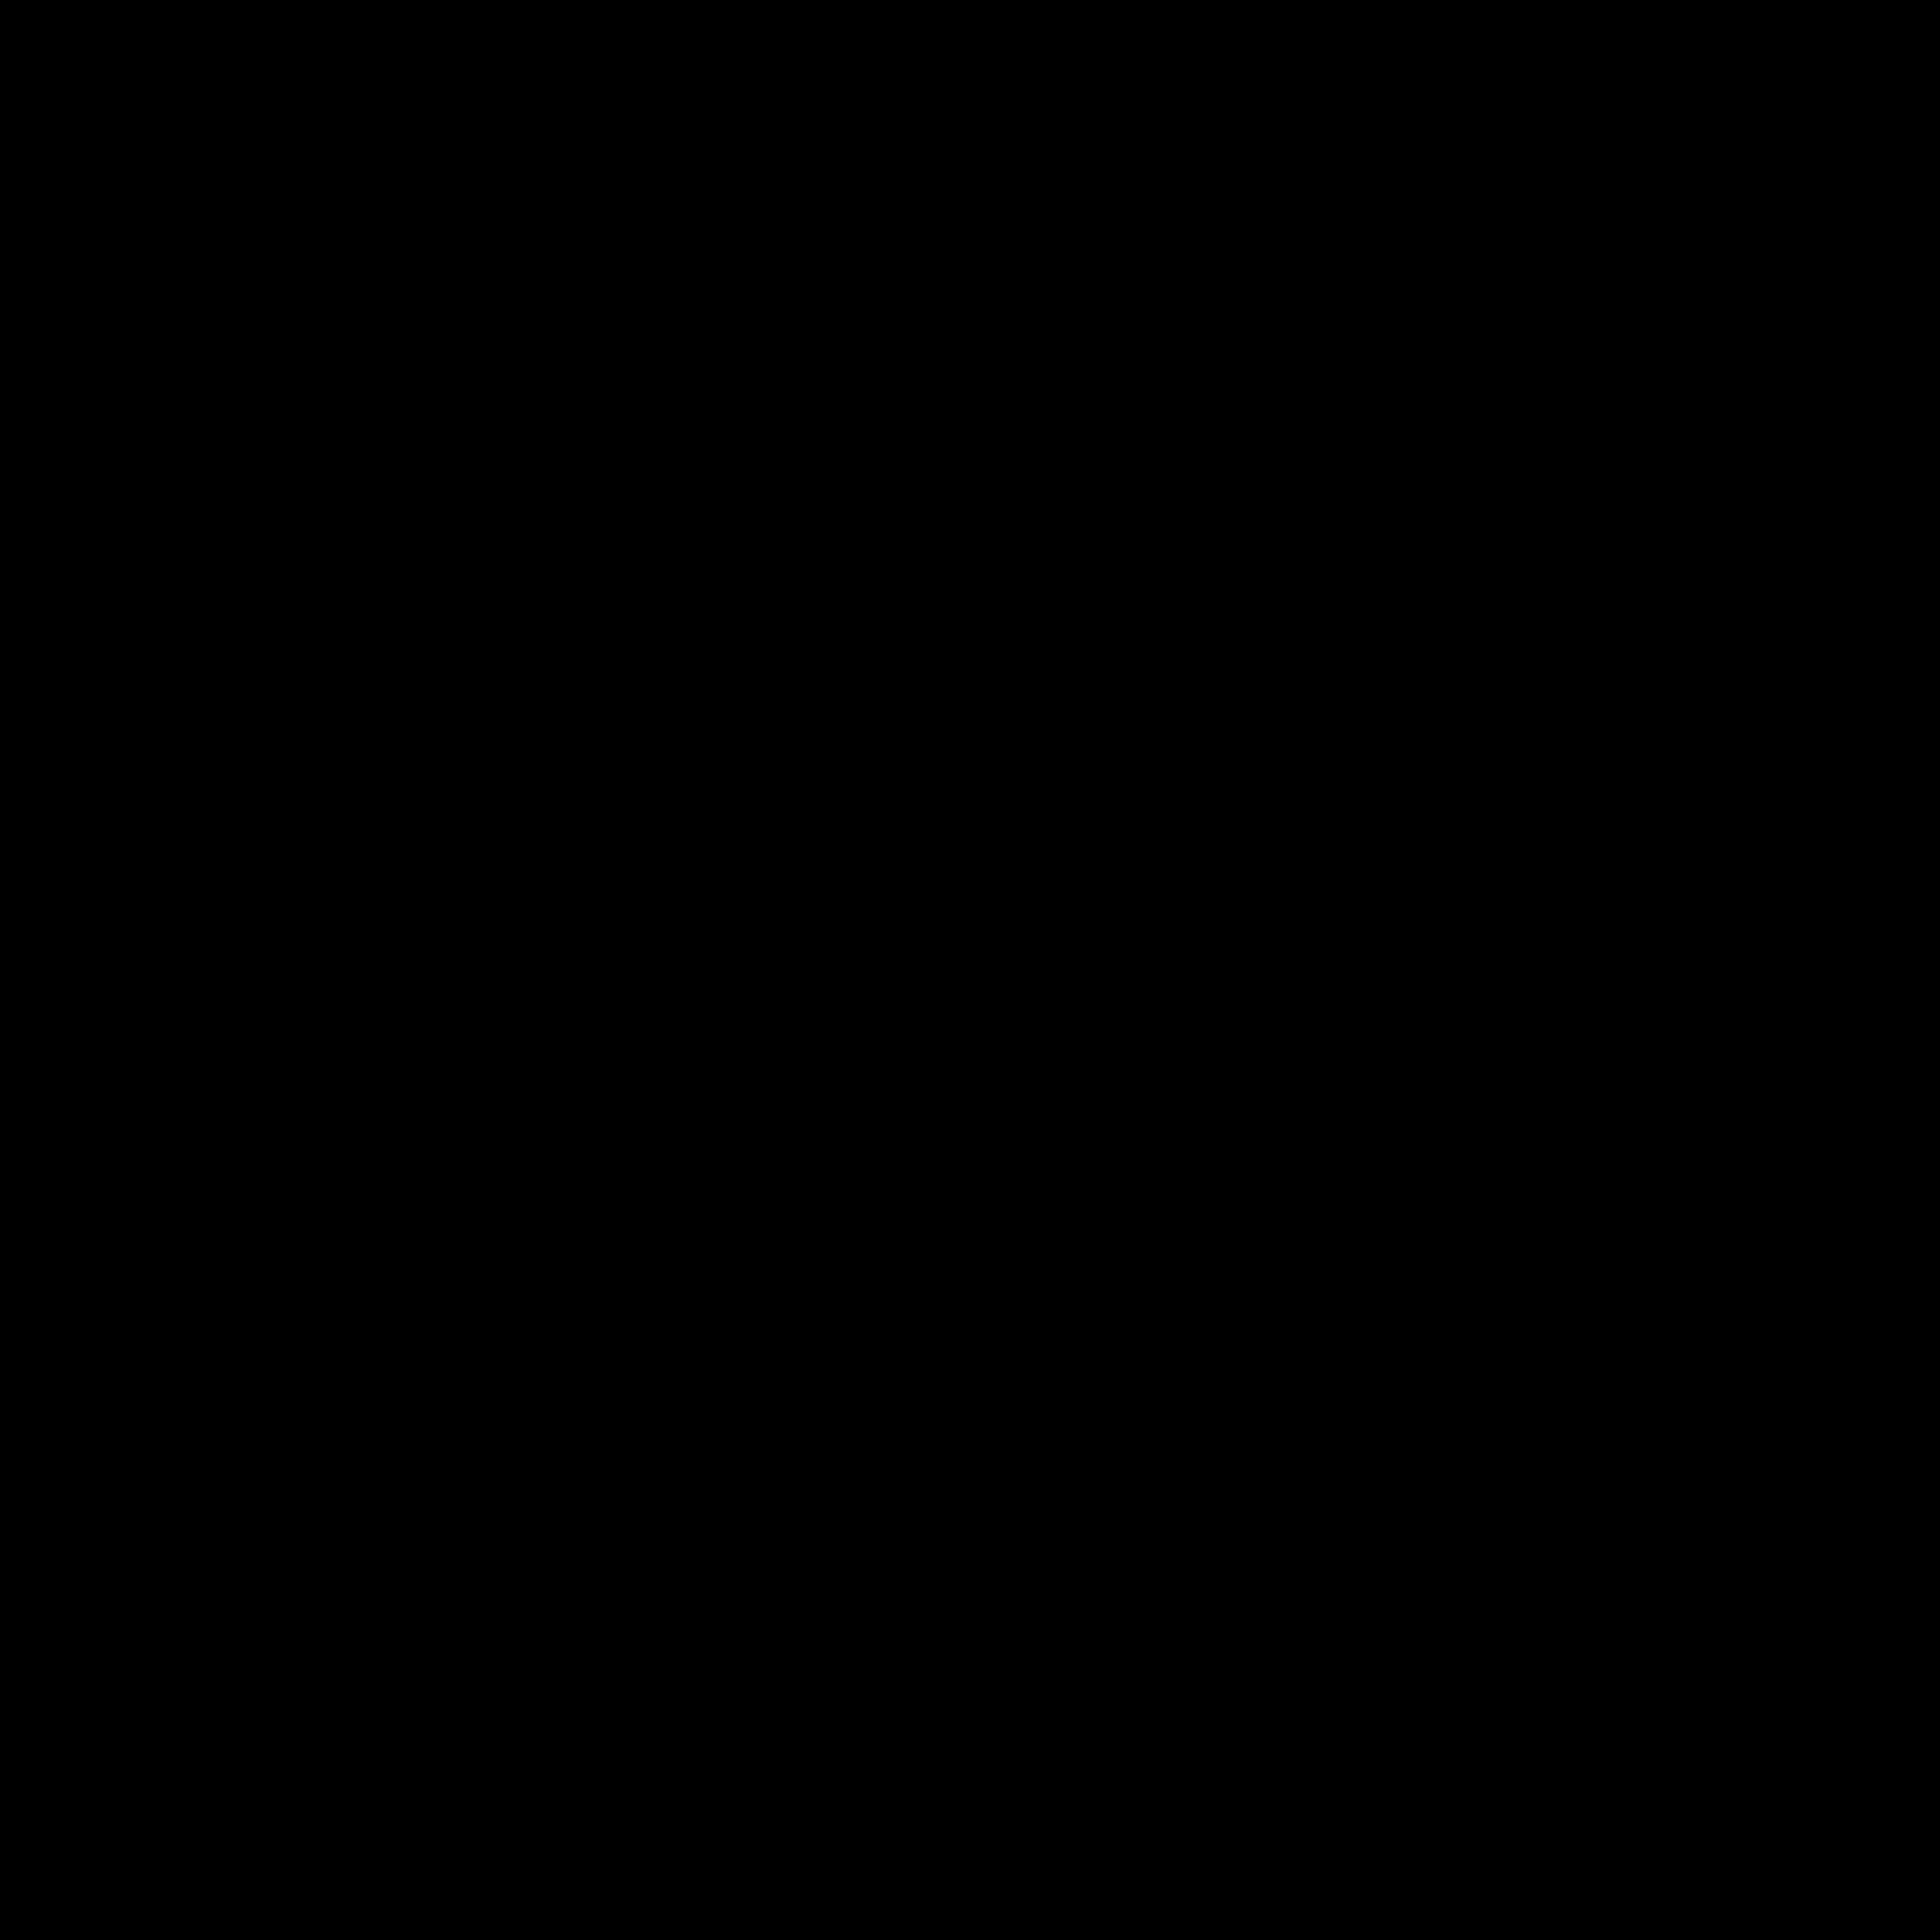 dean-deluca-logo-png-transparent.png